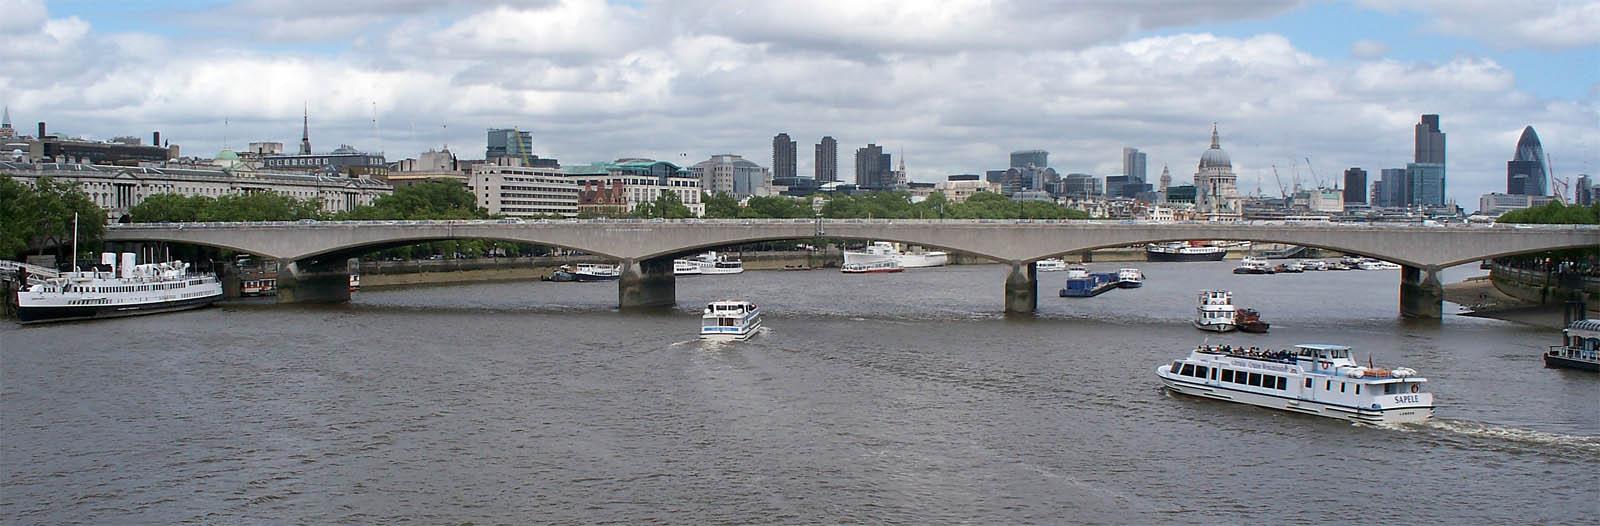 Waterloo Bridge (London)